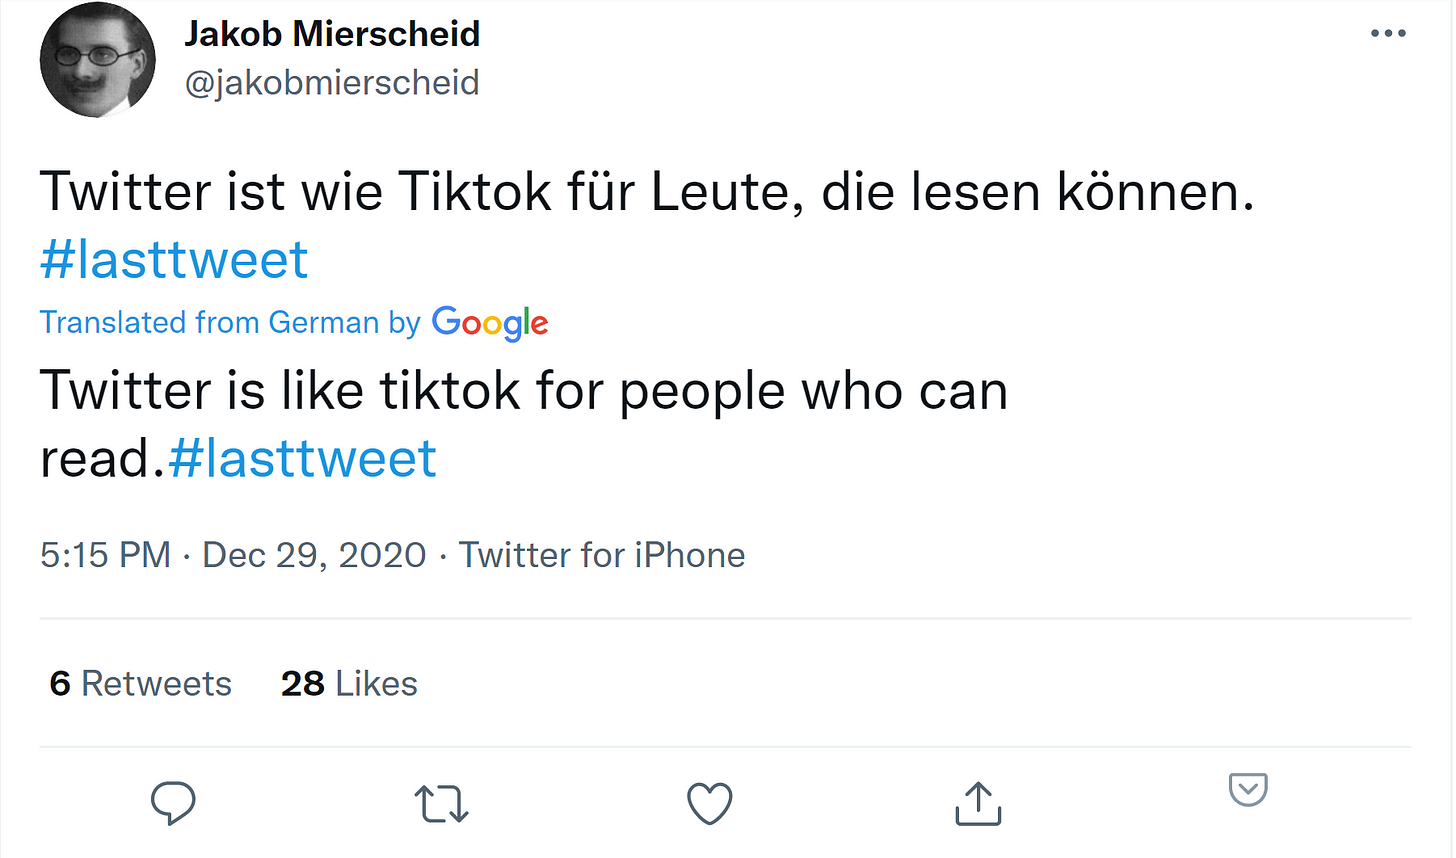 https://twitter.com/jakobmierscheid/status/1344044353803661312?s=20